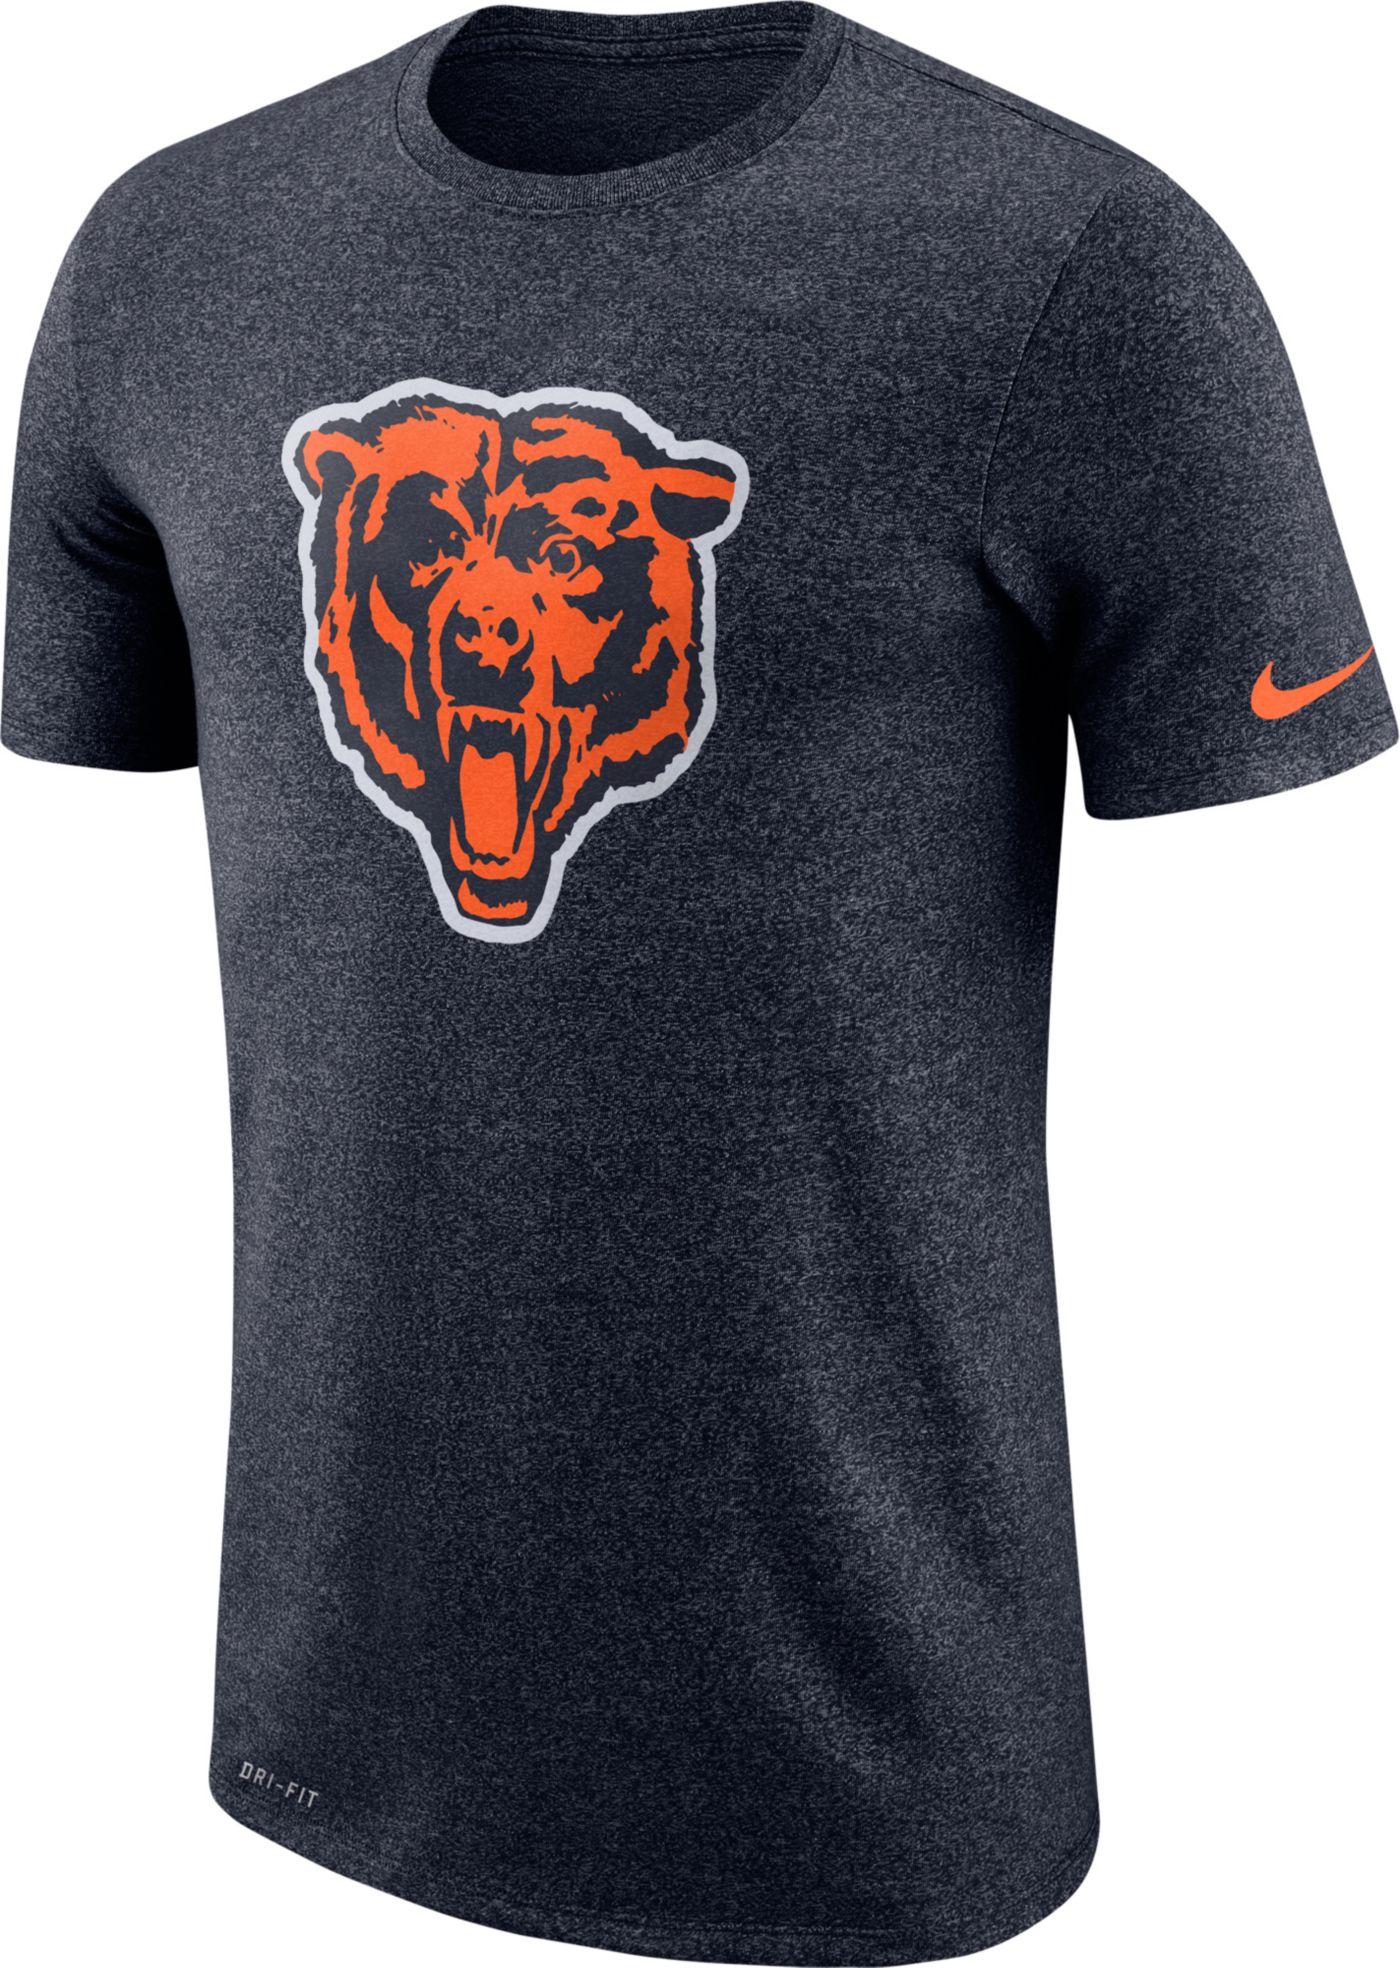 Nike Men's Chicago Bears Tri-Blend Historic Marled Navy T-Shirt